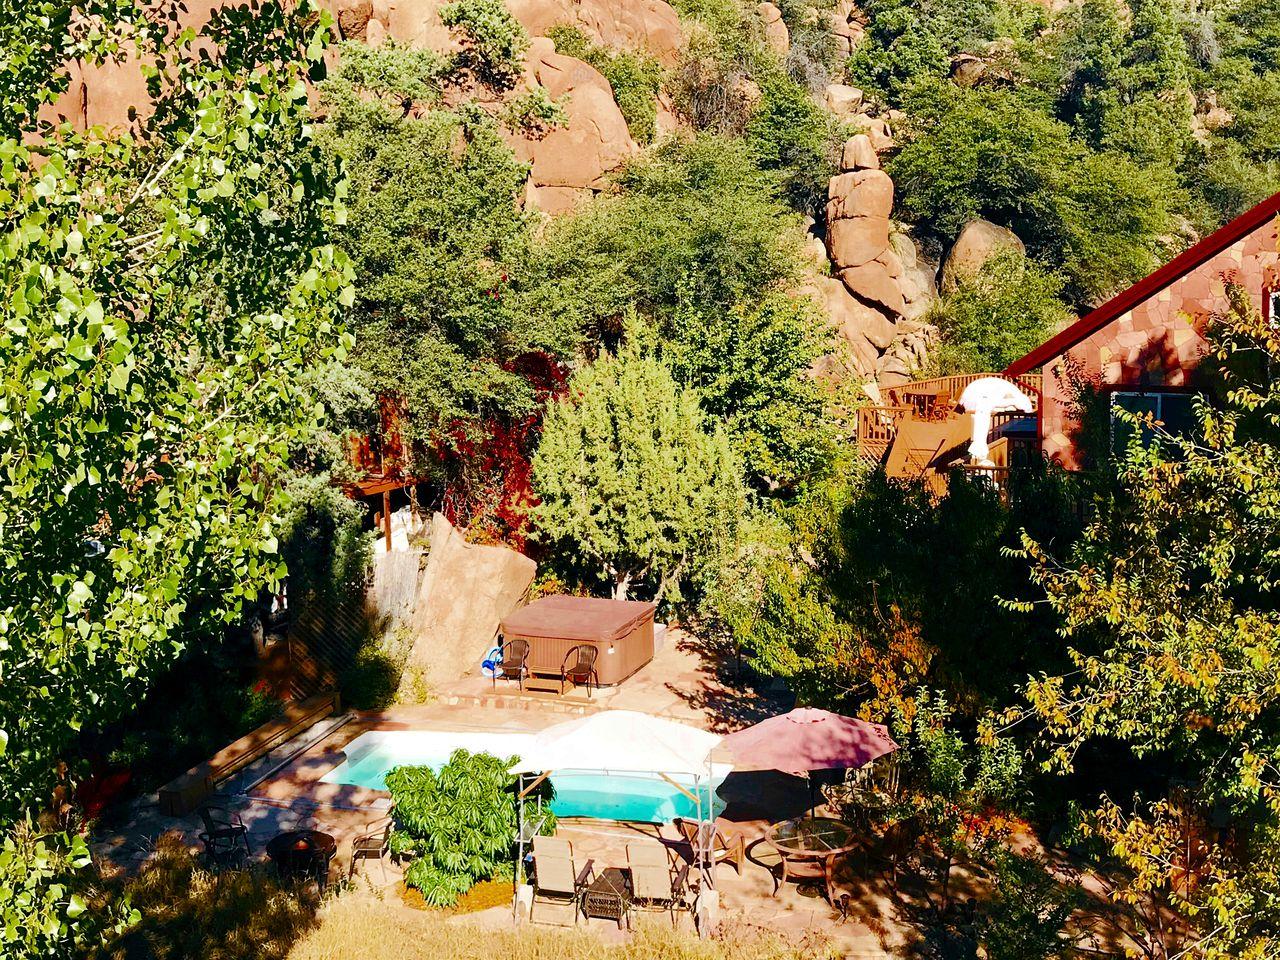 Rejuvenating Tree House Getaway with Pool Access in Prescott, Arizona